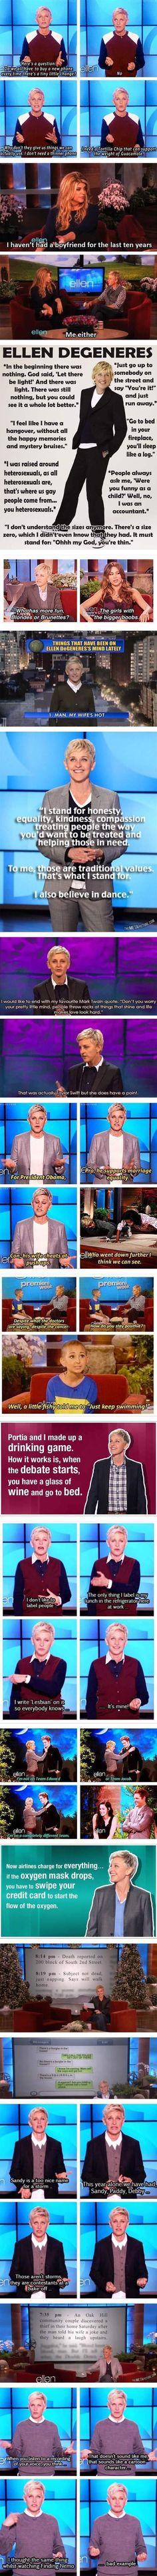 The wittiness of Ellen.